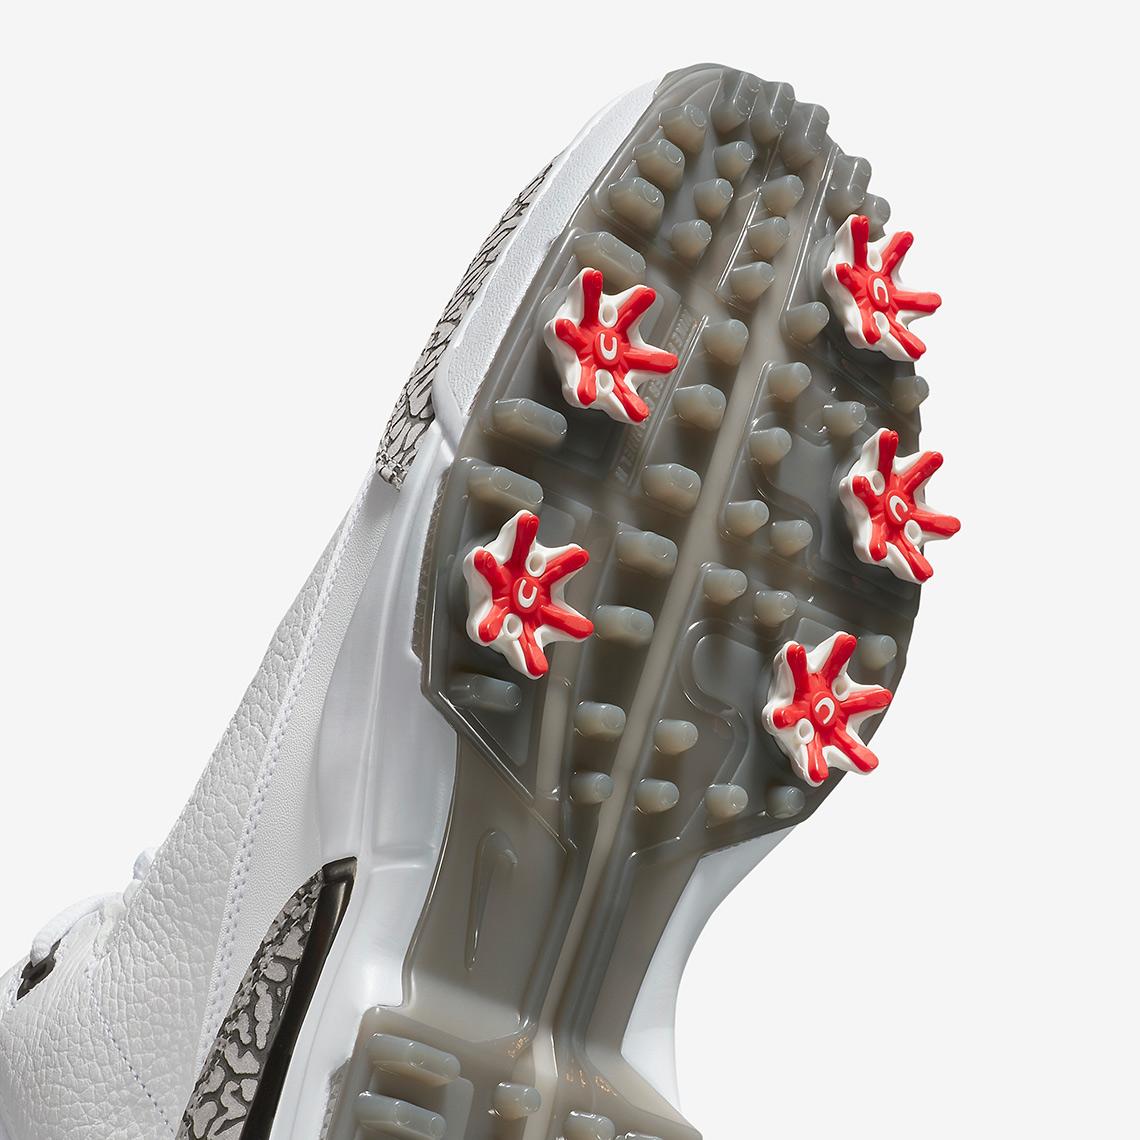 169be502f7b131 Advertisement. Advertisement. Air Jordan 3 Golf Shoe Release Date  ...